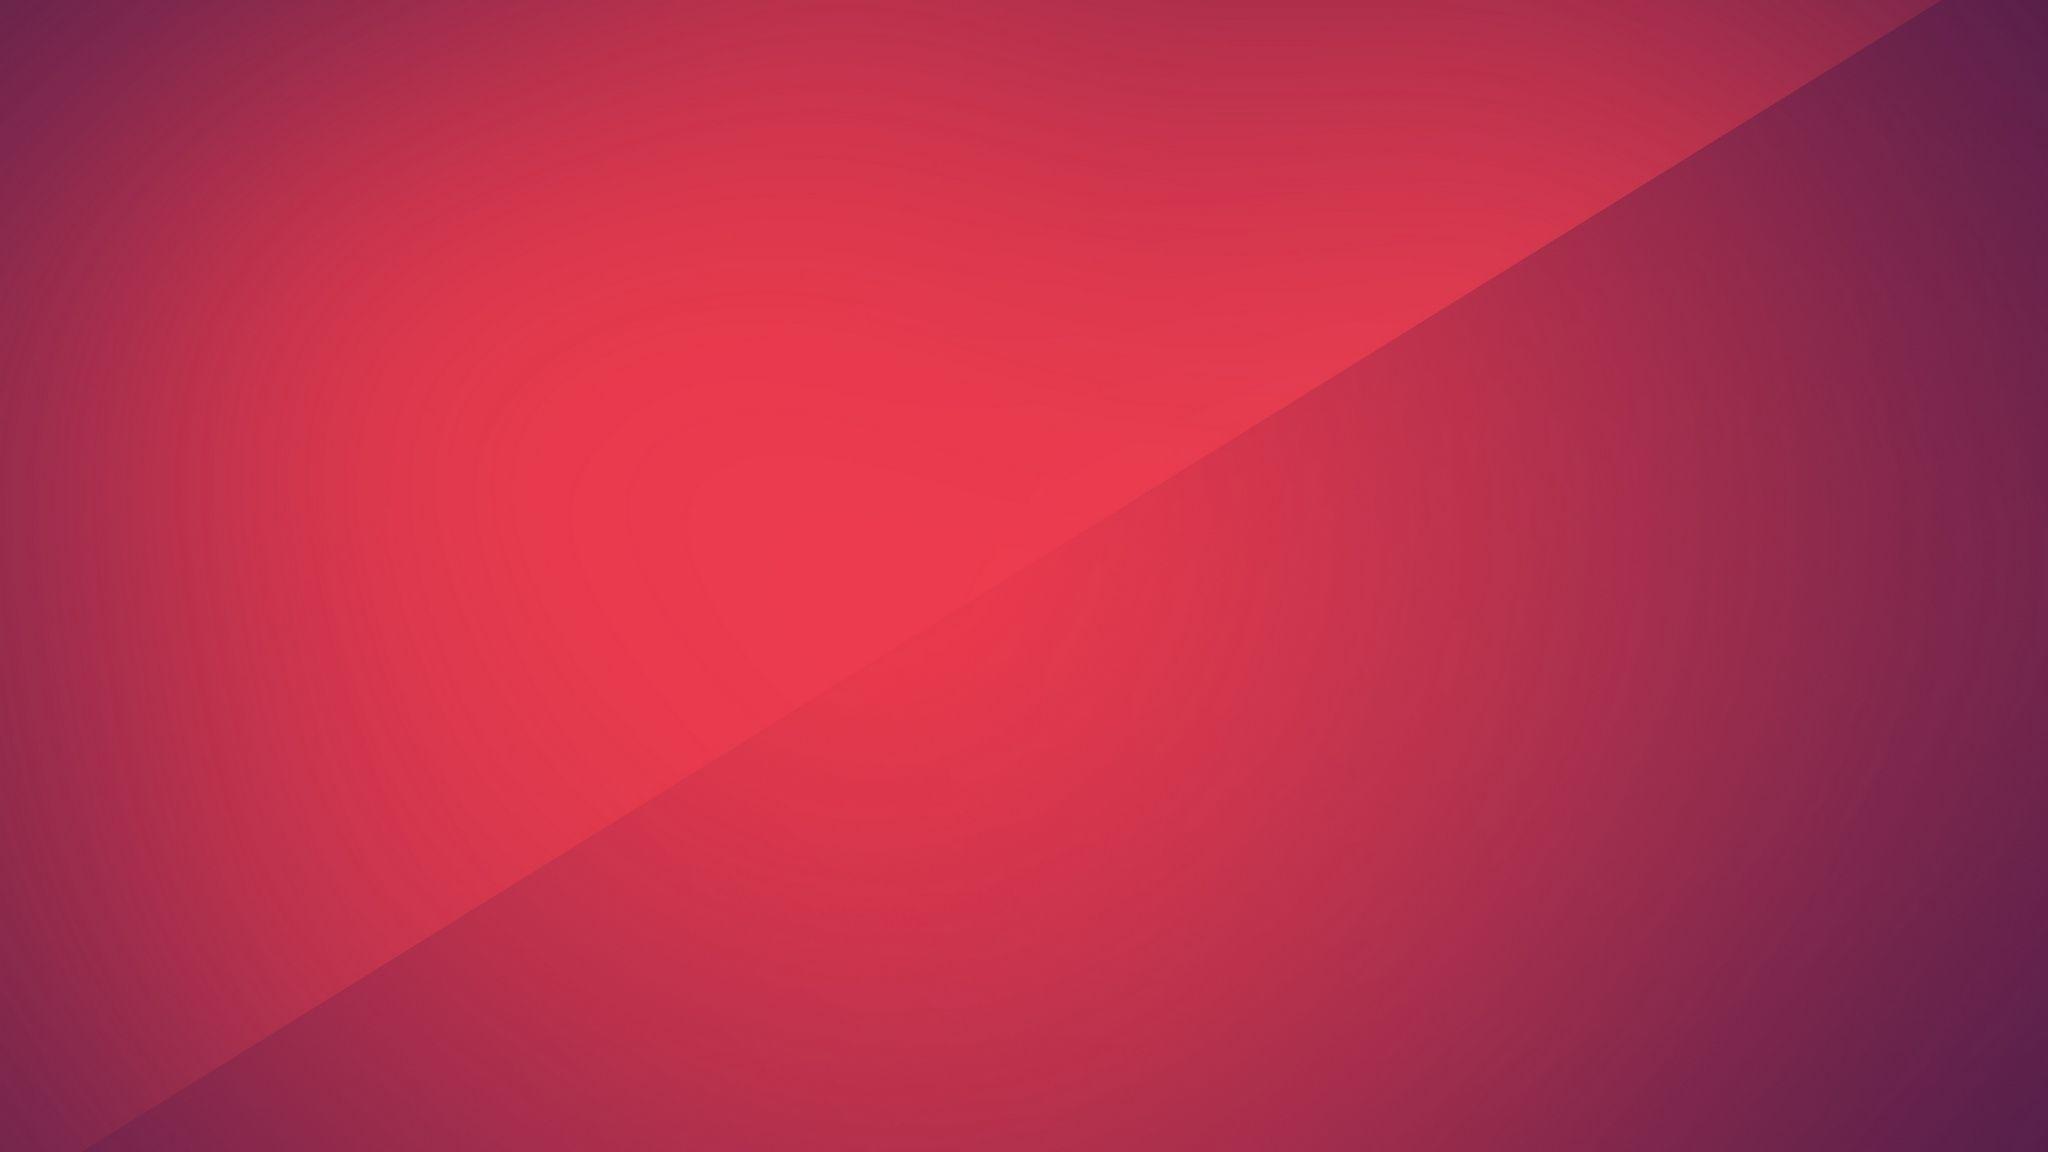 Banner 2048x1152 1080p